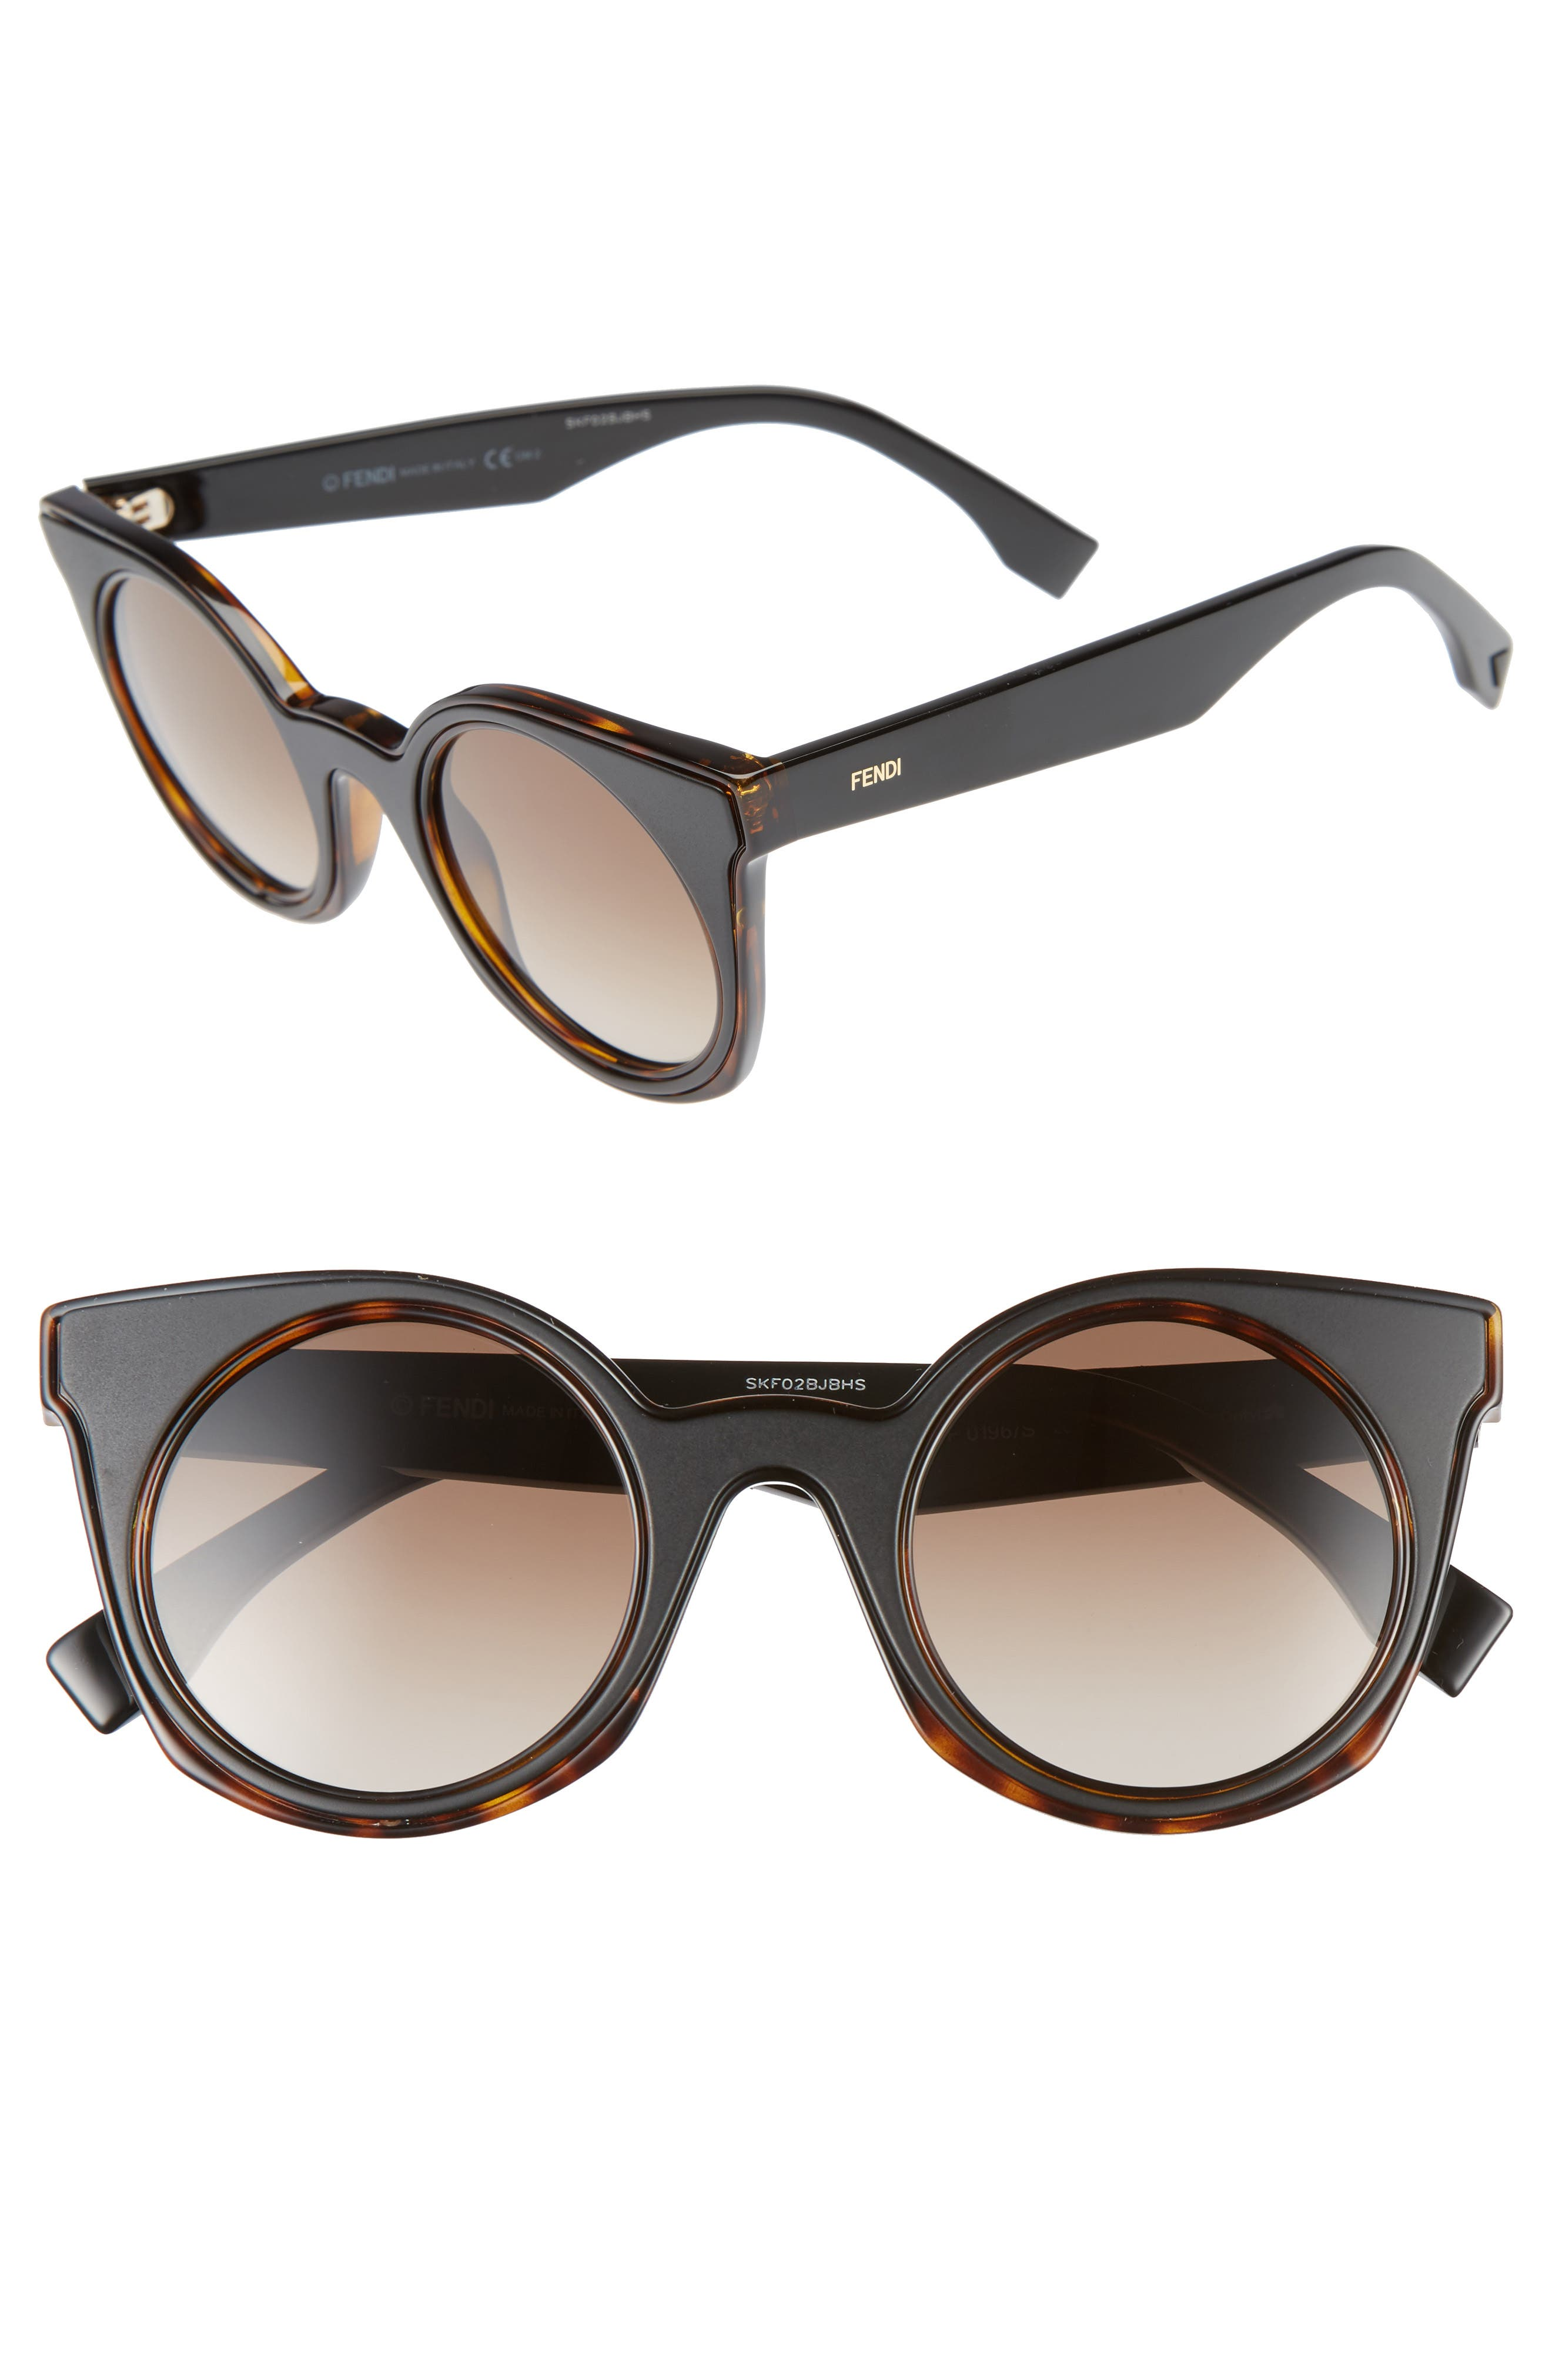 48mm Cat Eye Sunglasses,                         Main,                         color, 210